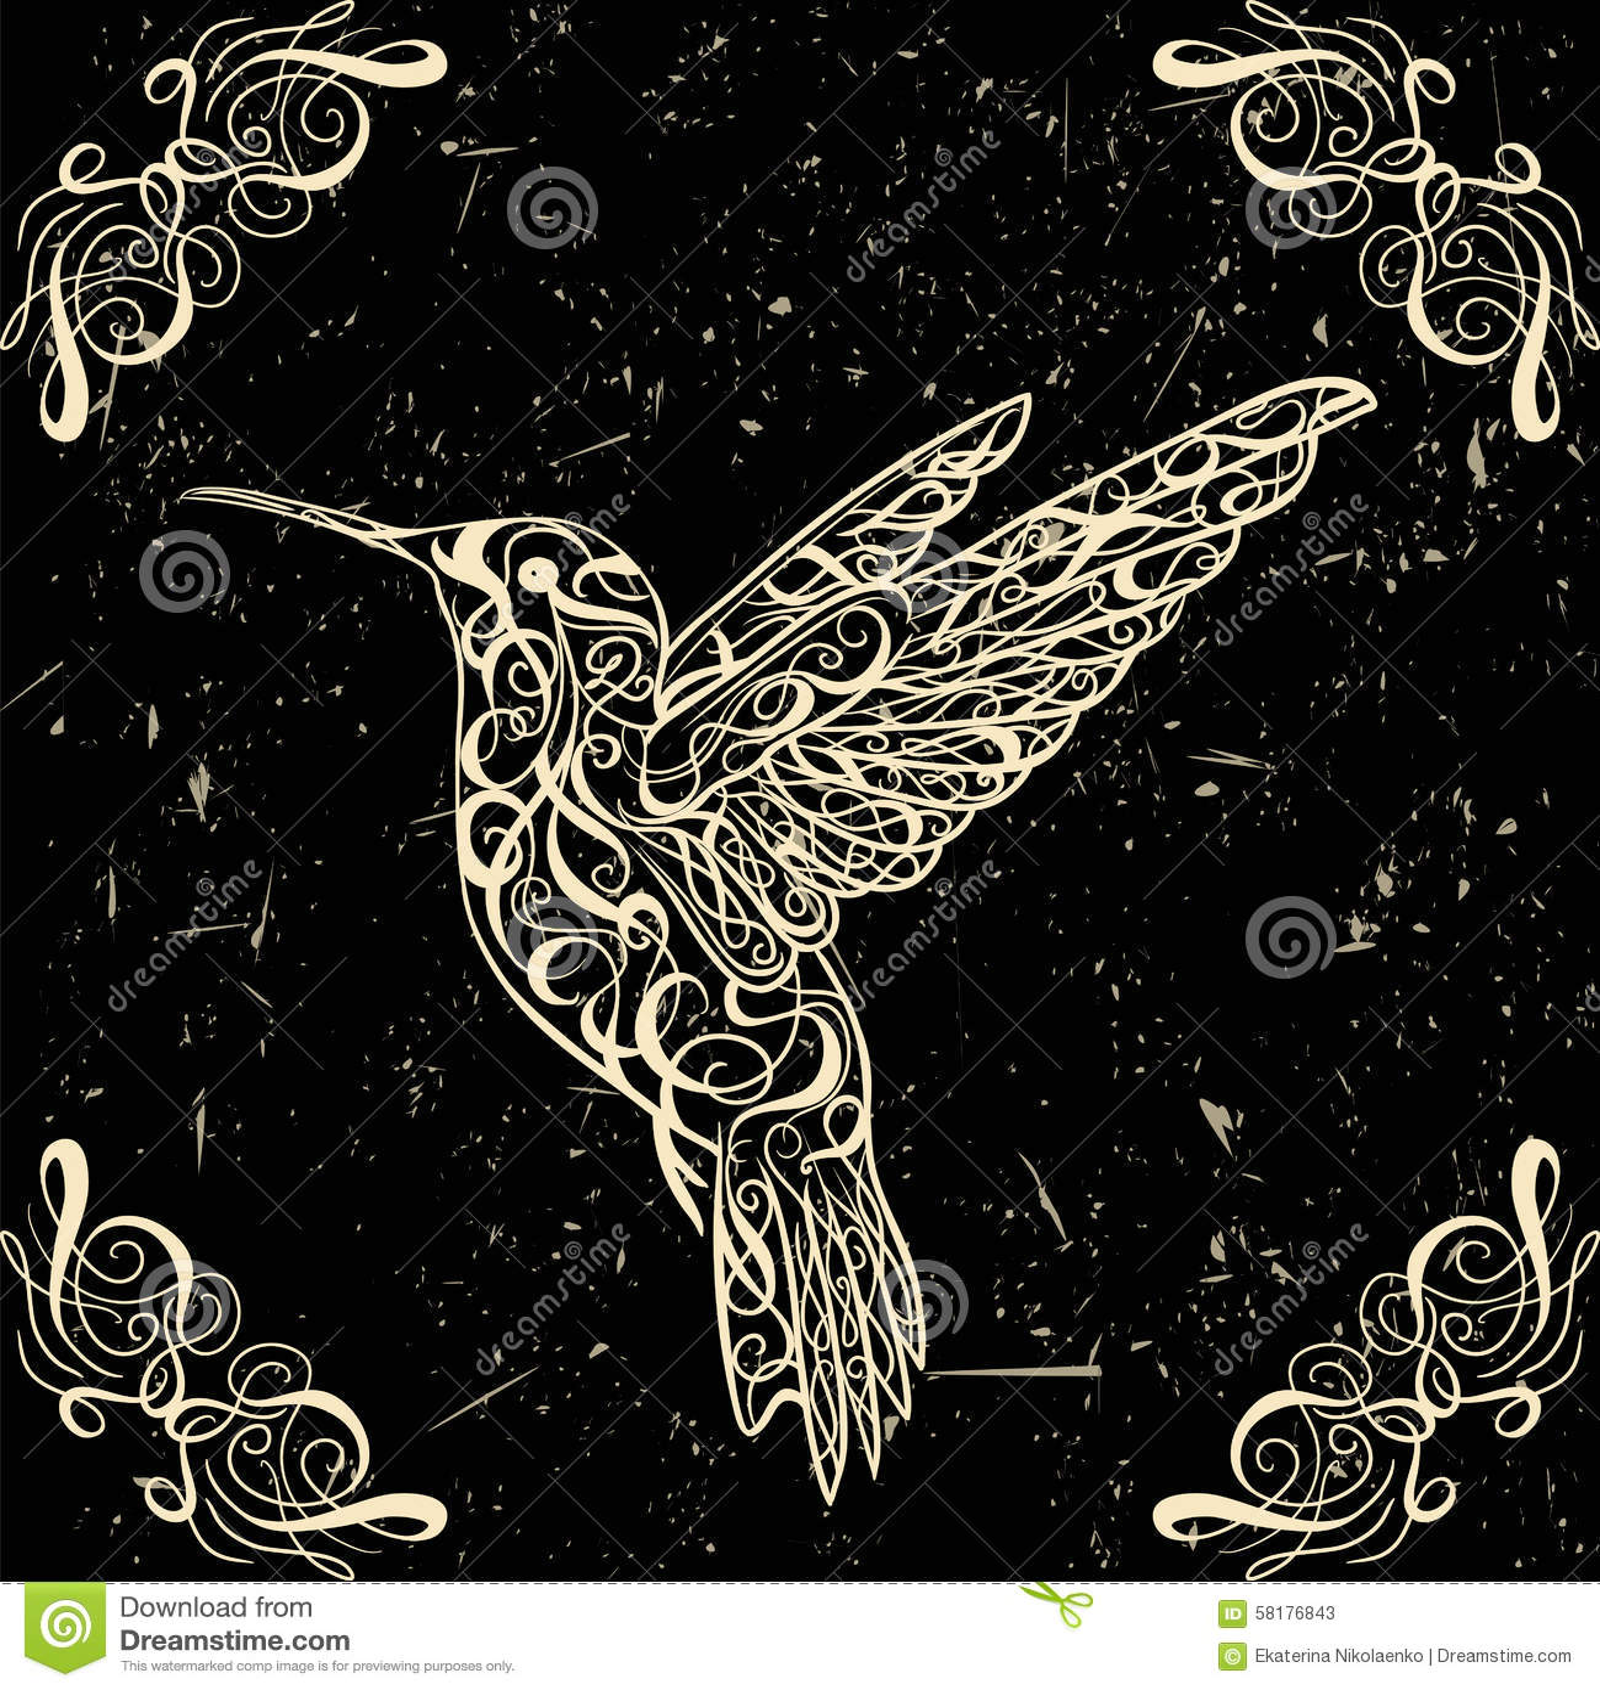 Hummingbird. Tattoo art. Retro banner, invitation,card, scrap booking. t-shirt, bag, postcard, poster.